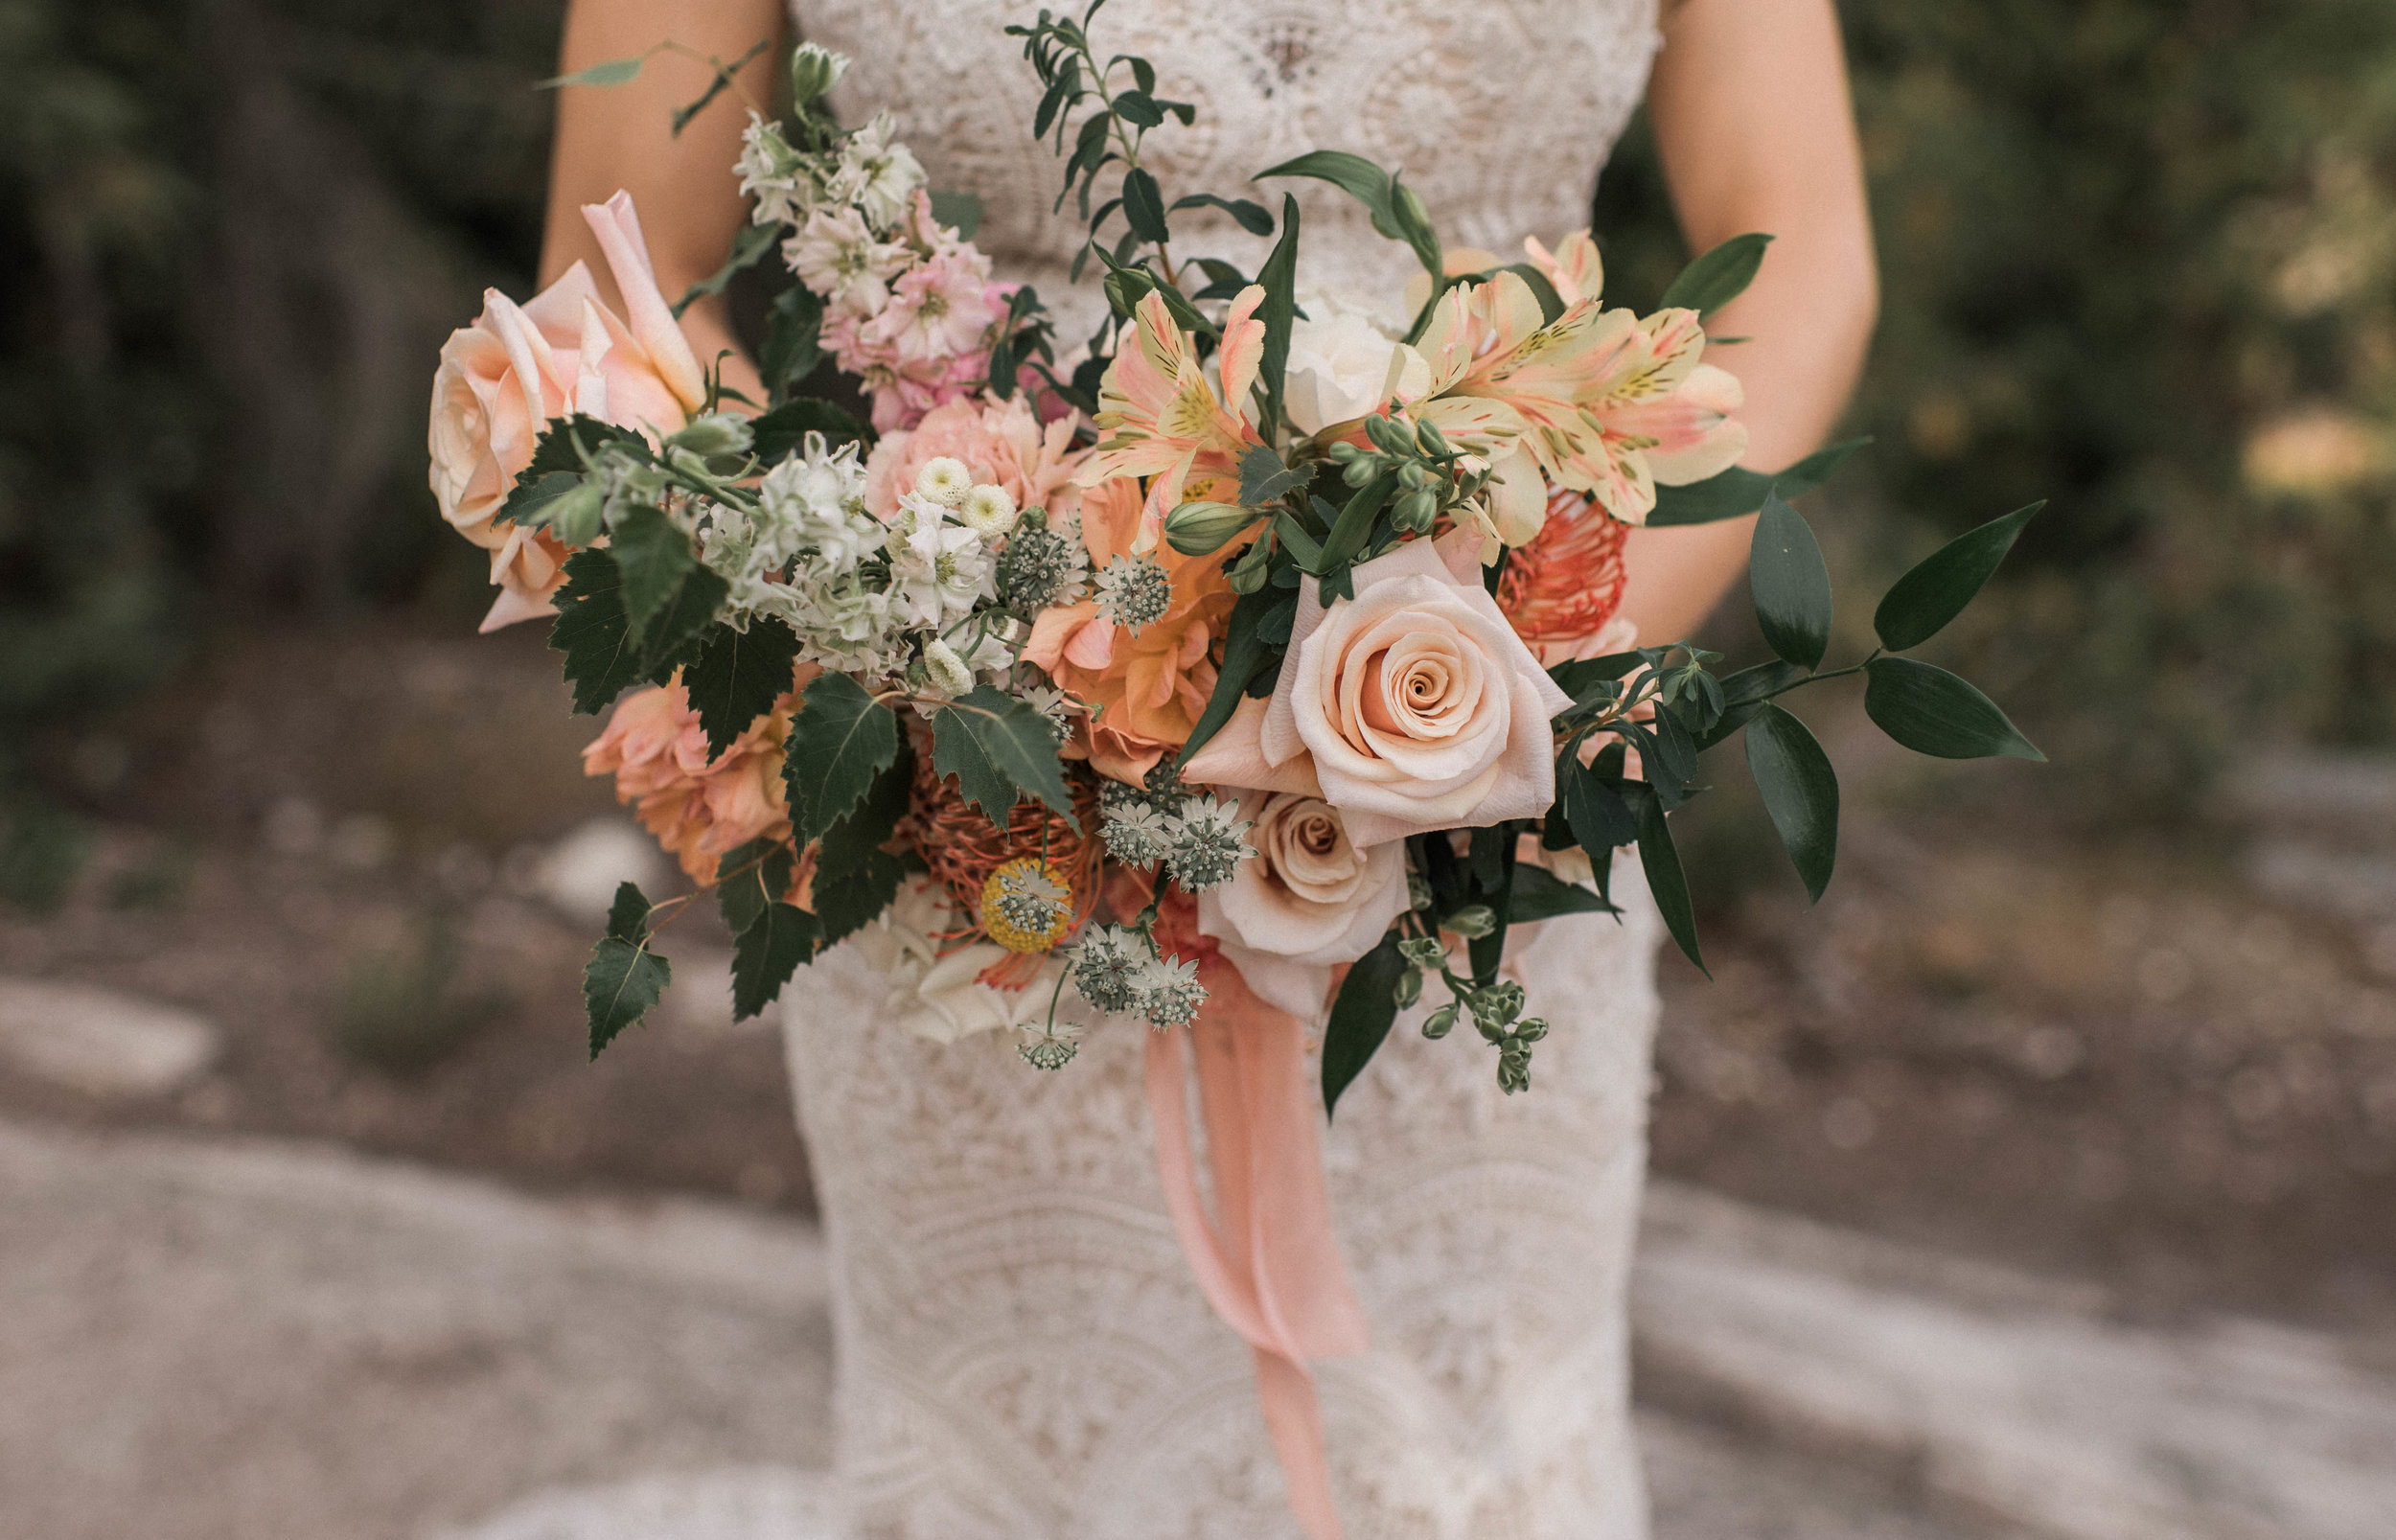 austin-texas-wedding-photography-1778-photographie-51.jpg